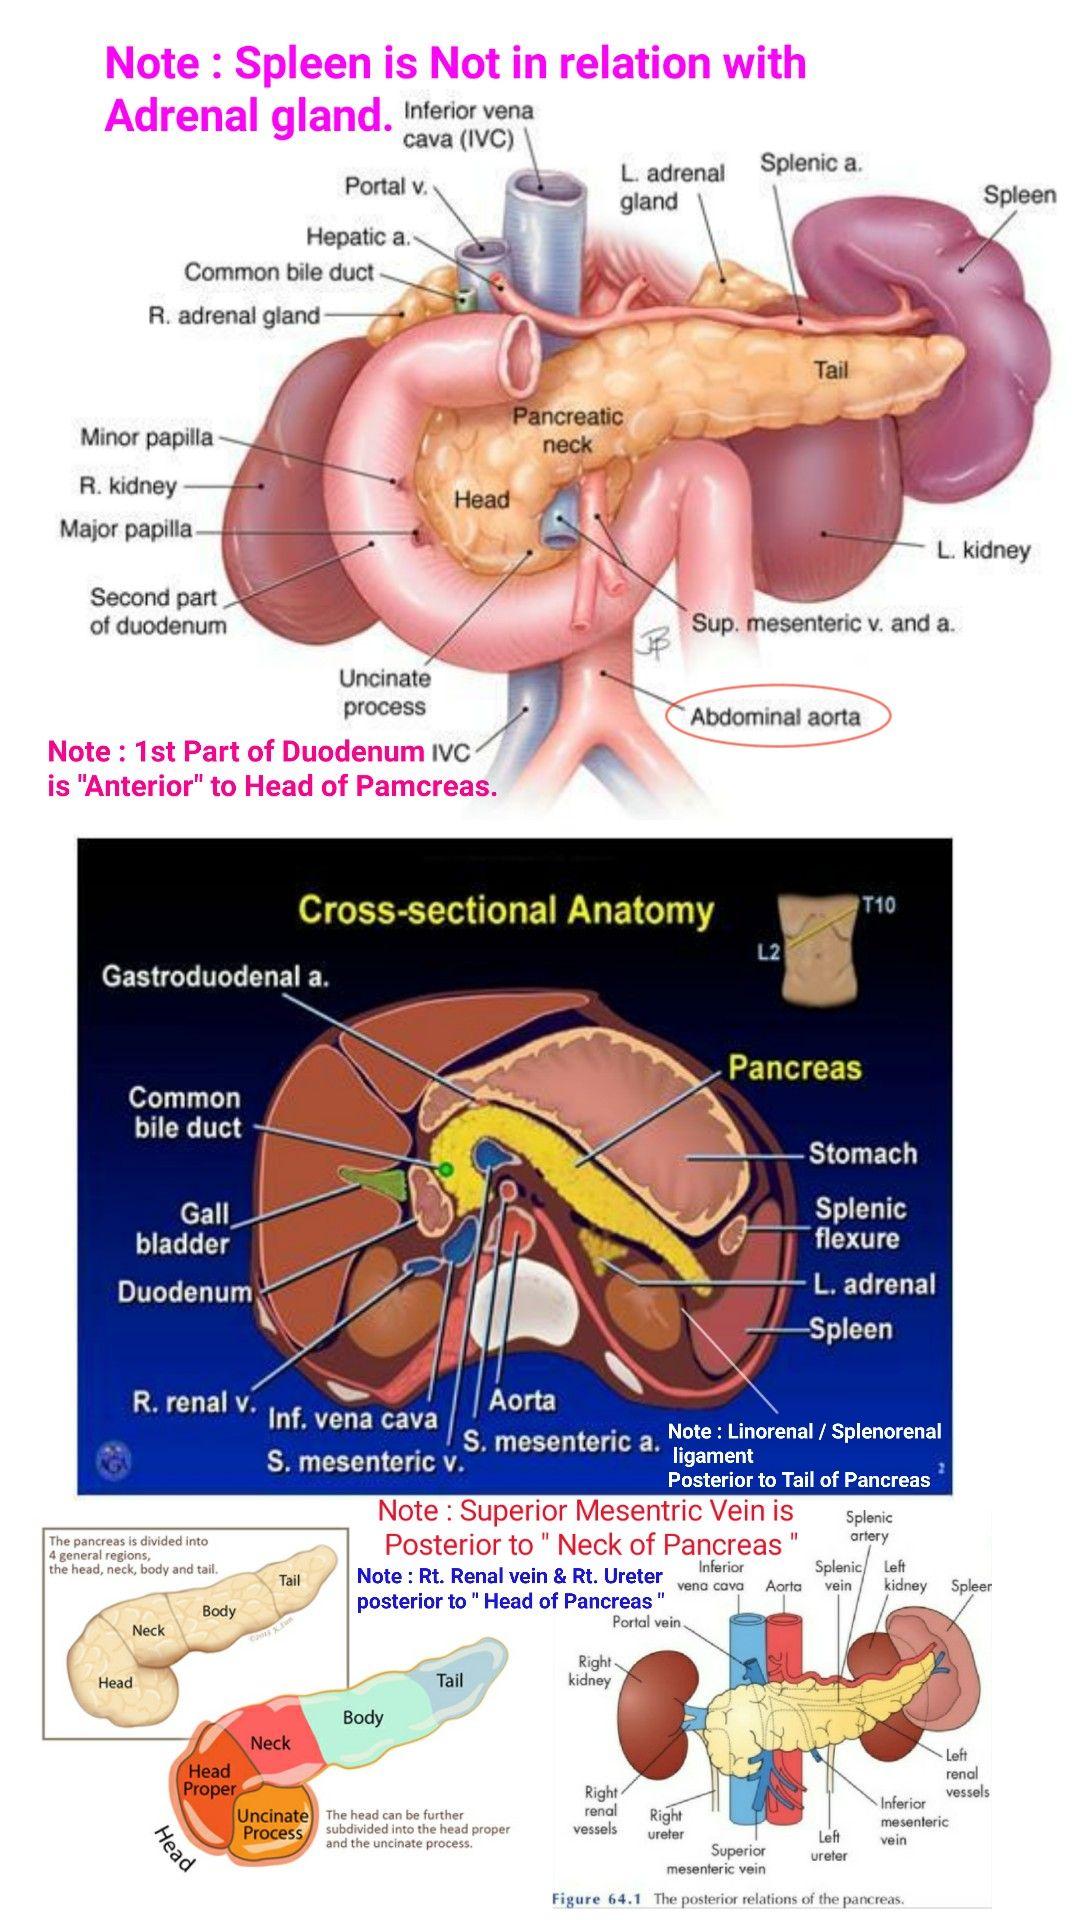 cancer pancreatic neck